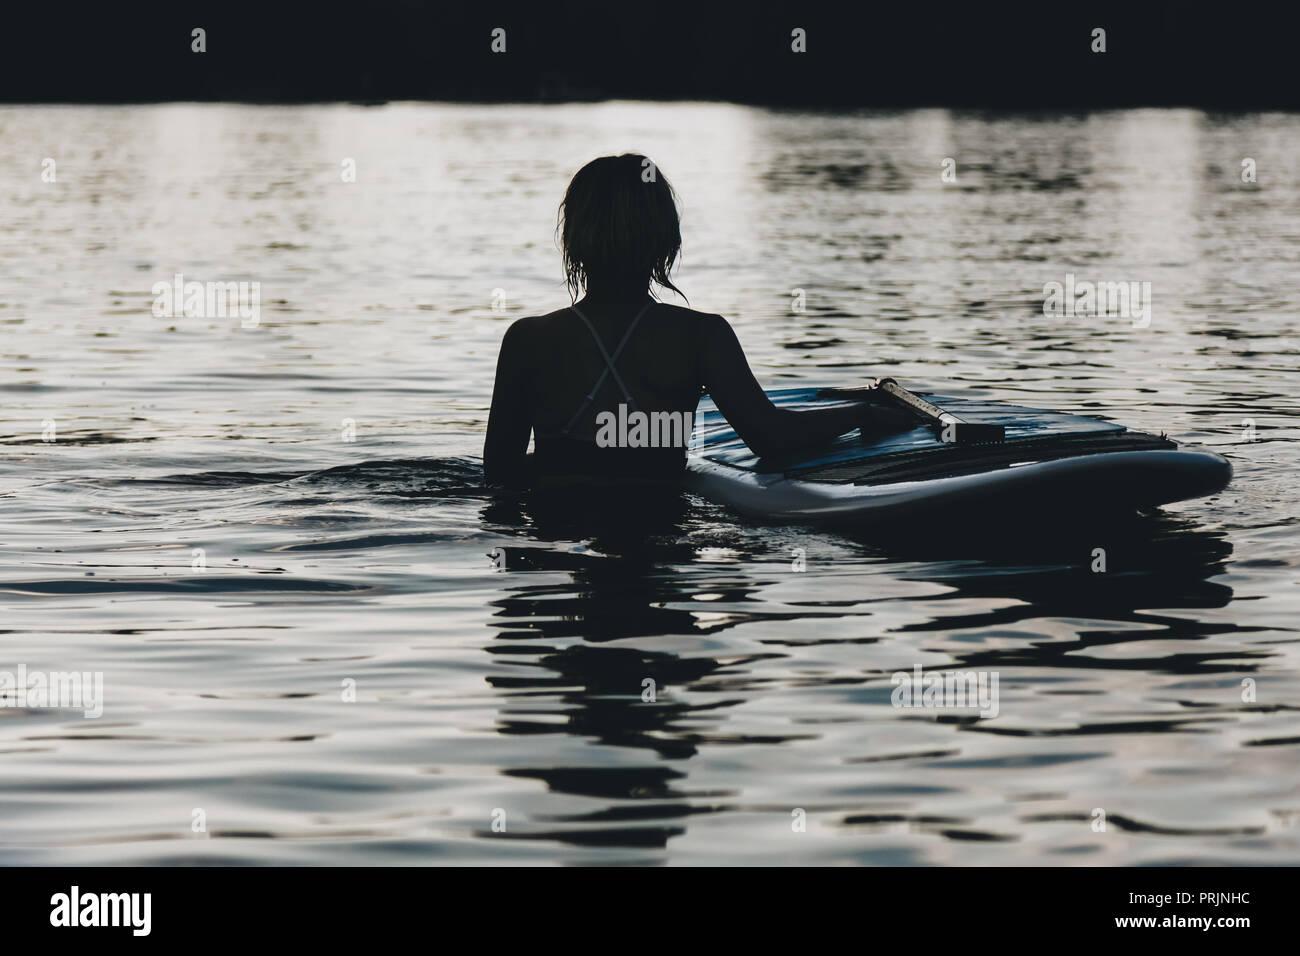 Silueta de mujer en agua con paddle board Imagen De Stock